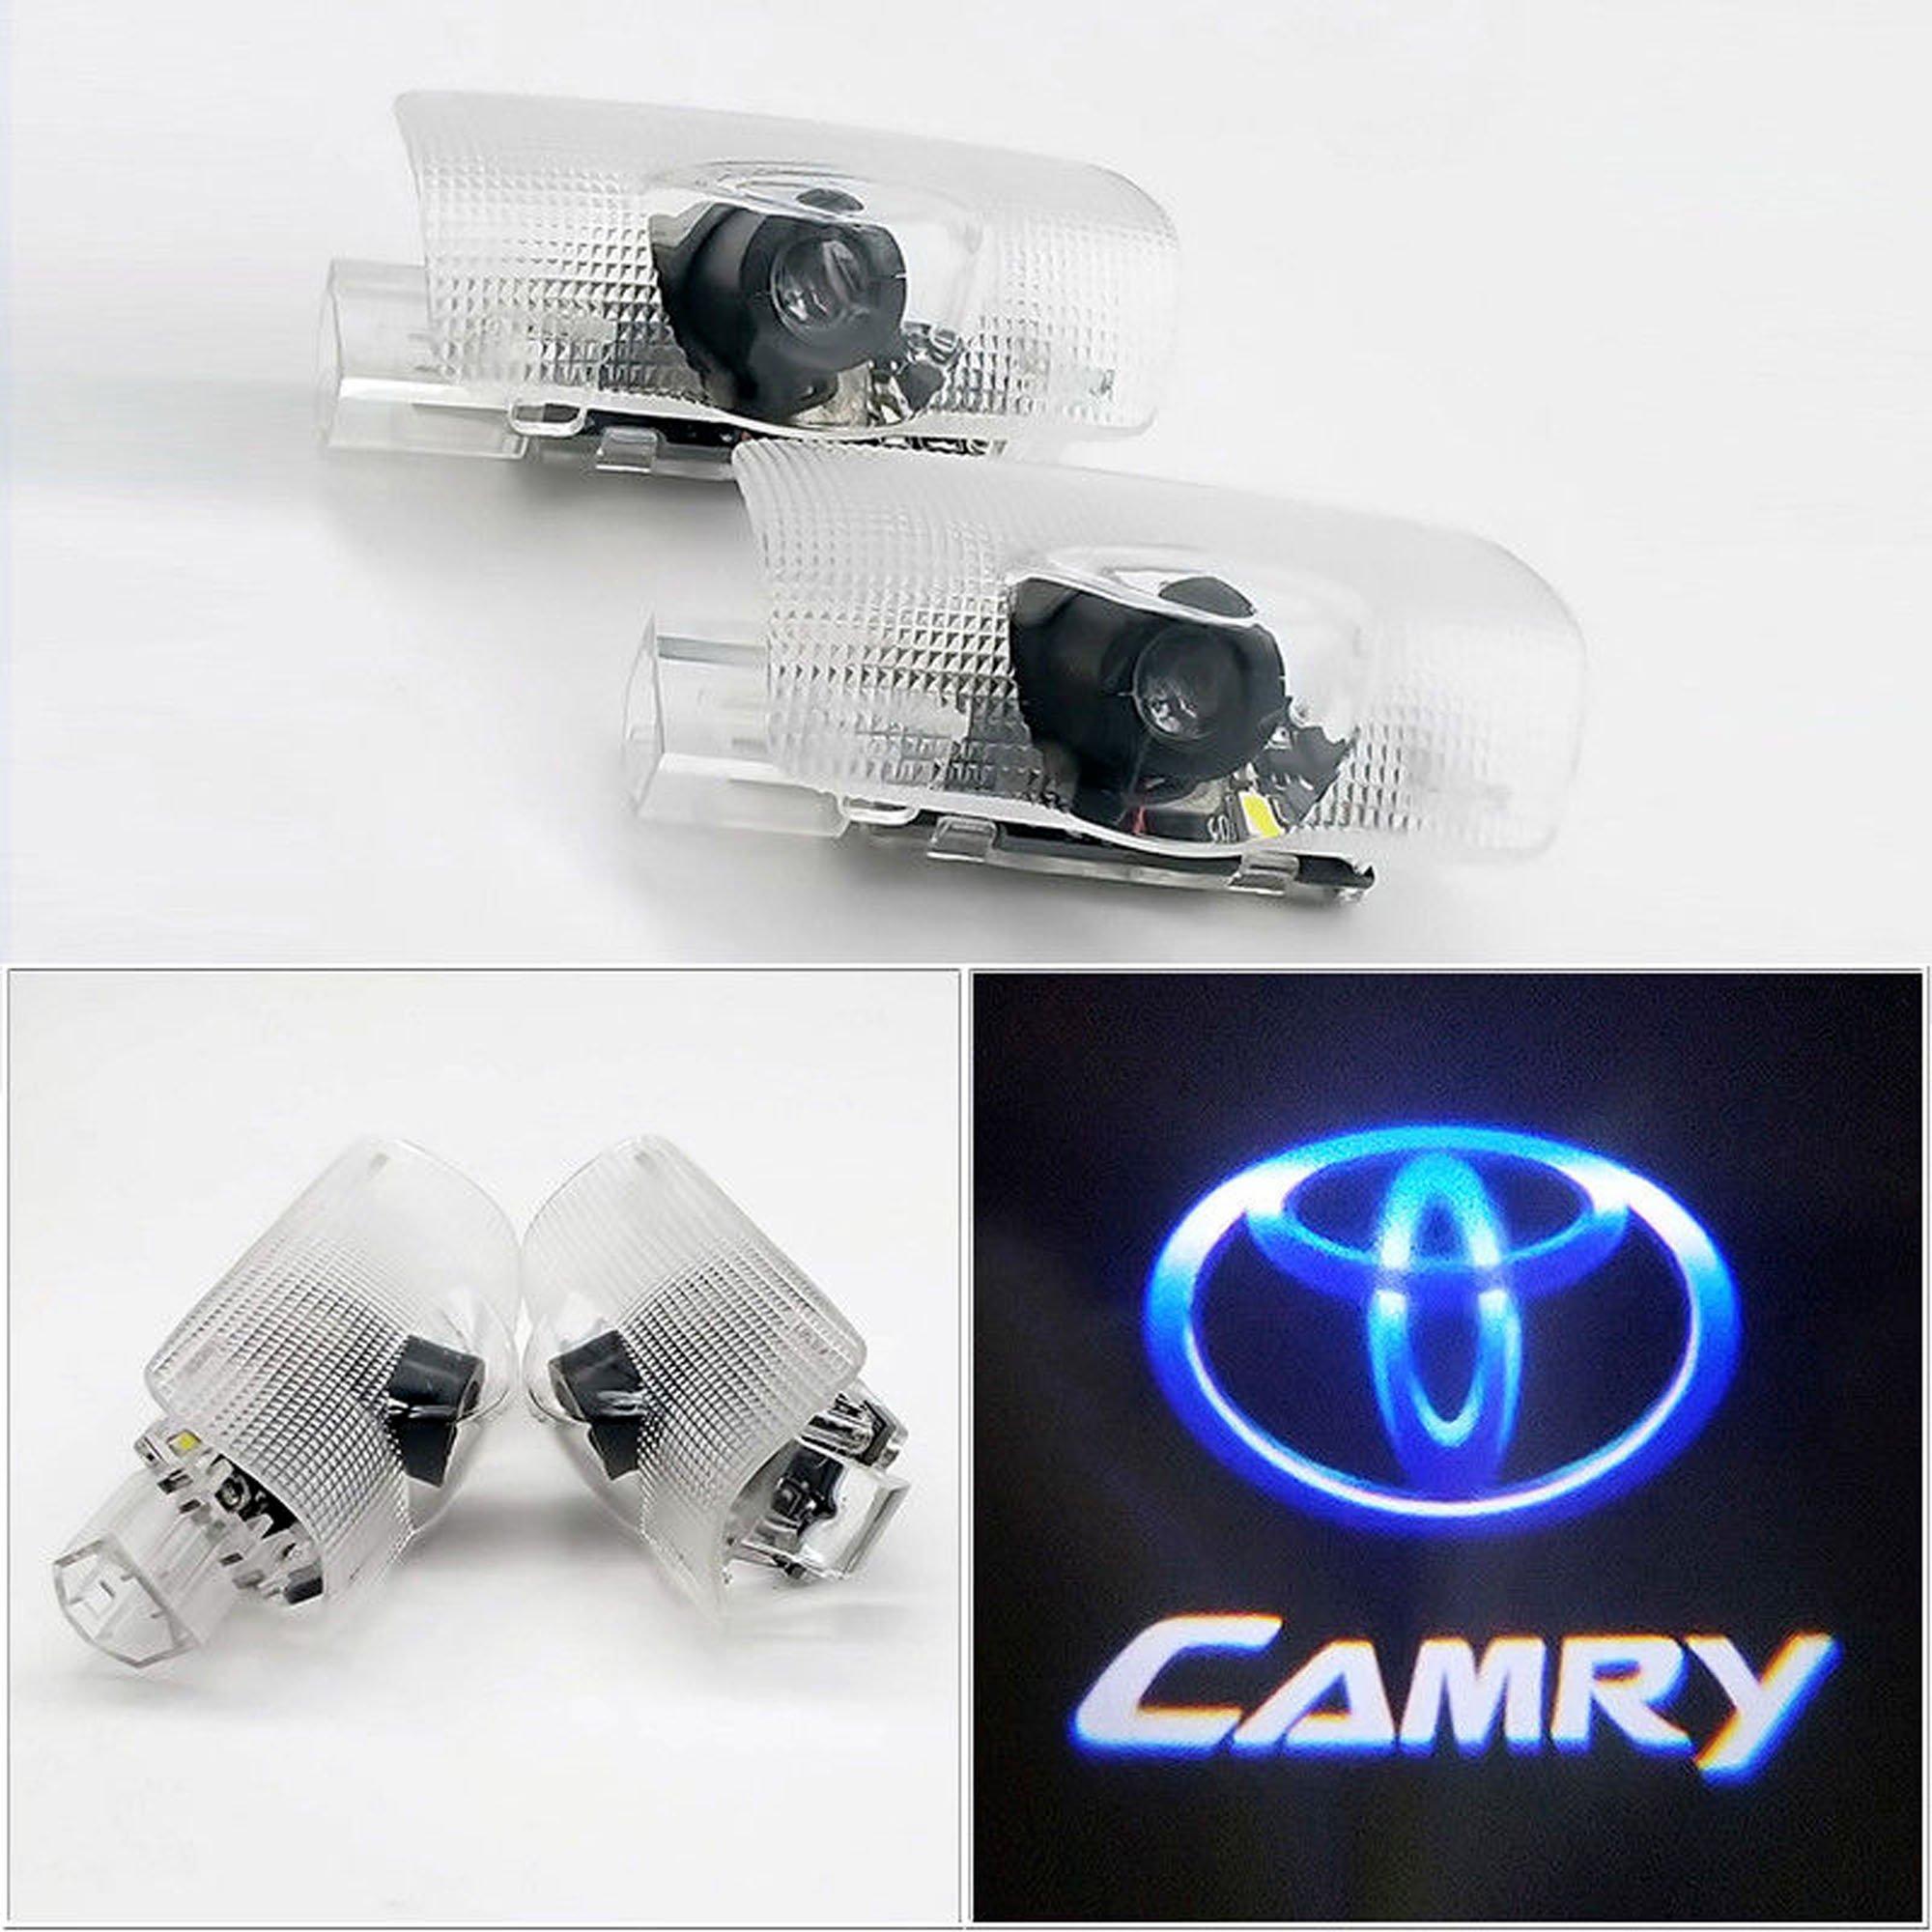 CNAutoLicht 2x LED Door Step Courtesy Light Welcome Light Shadow Logo Projector Lamp For Toyota Avalon Avanza Camry 2006-2016